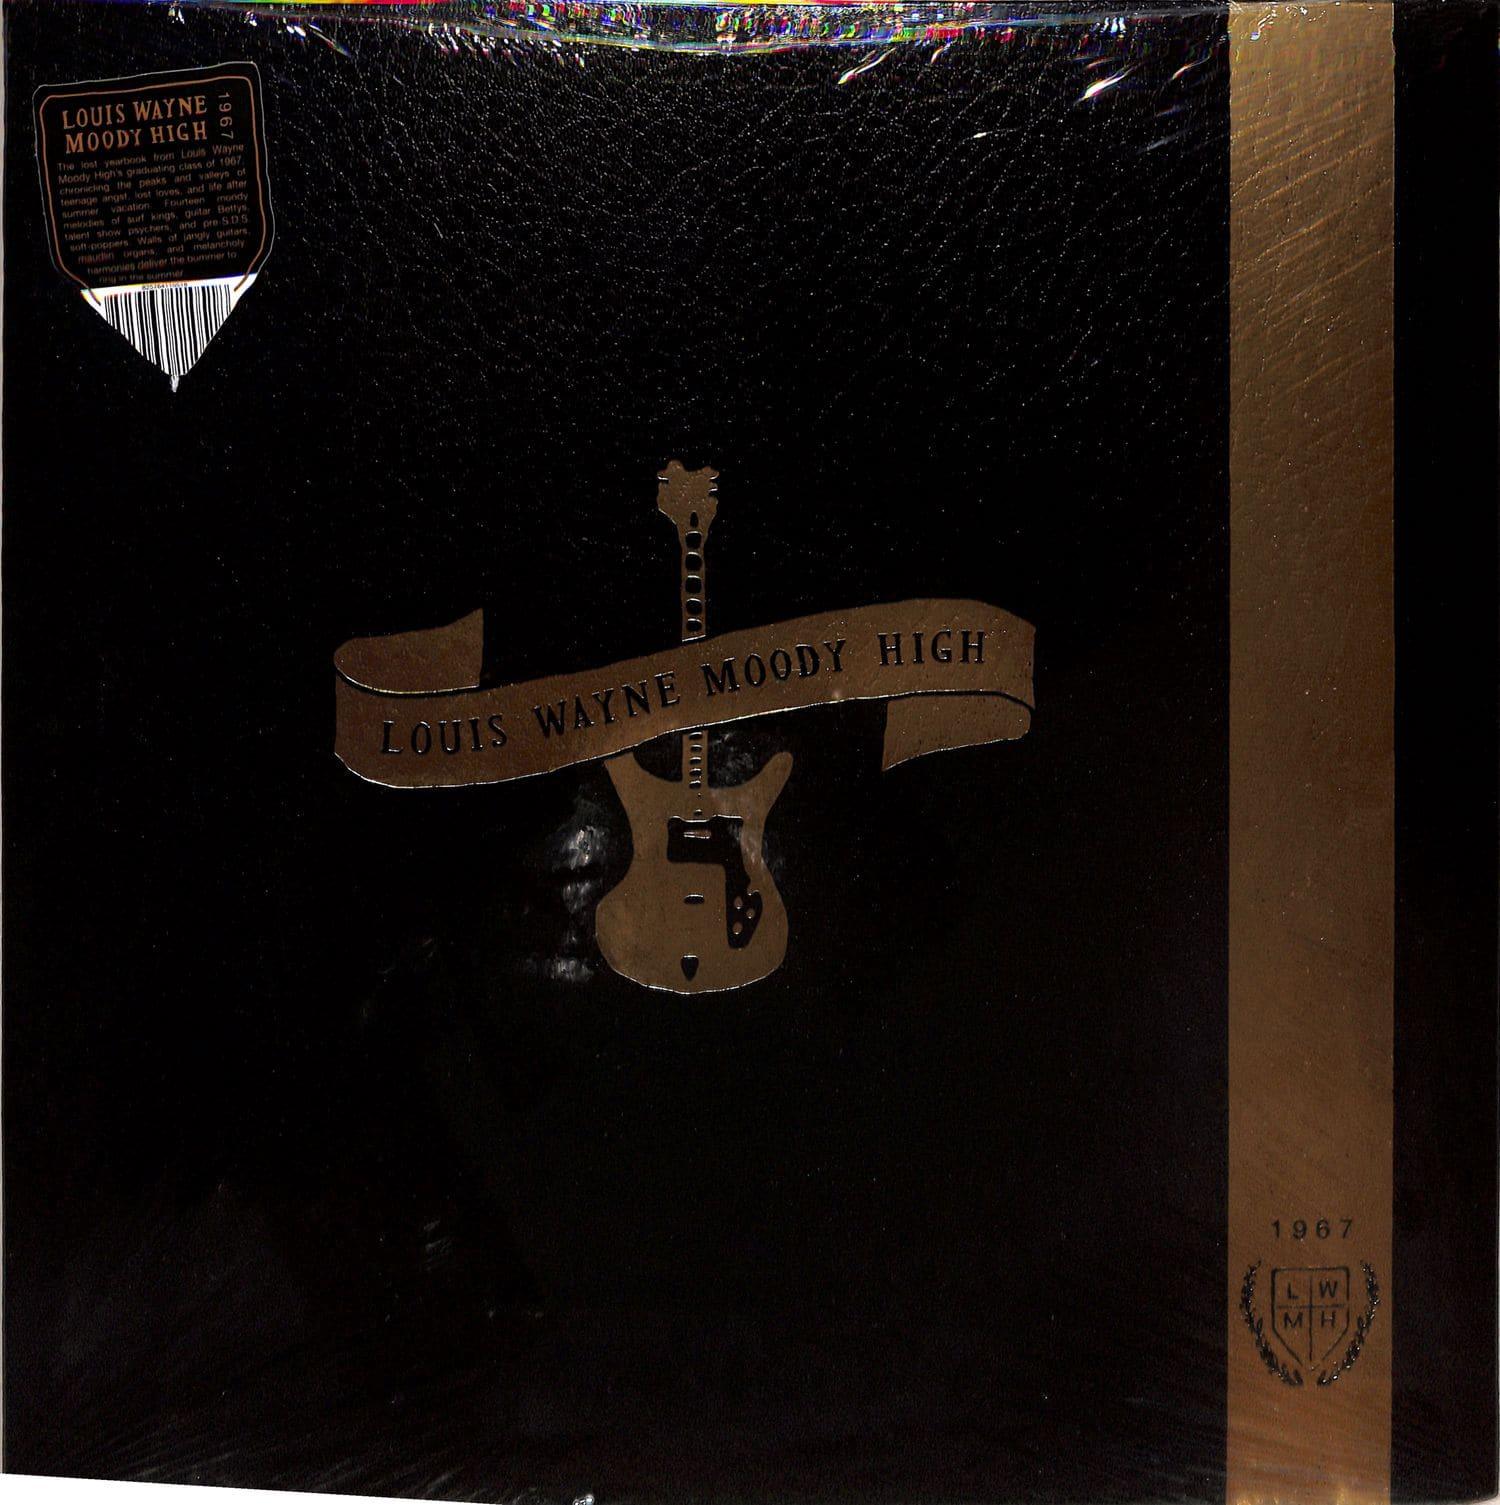 Various Artists - LOUIS WAYNE MOODY HIGH: 1967